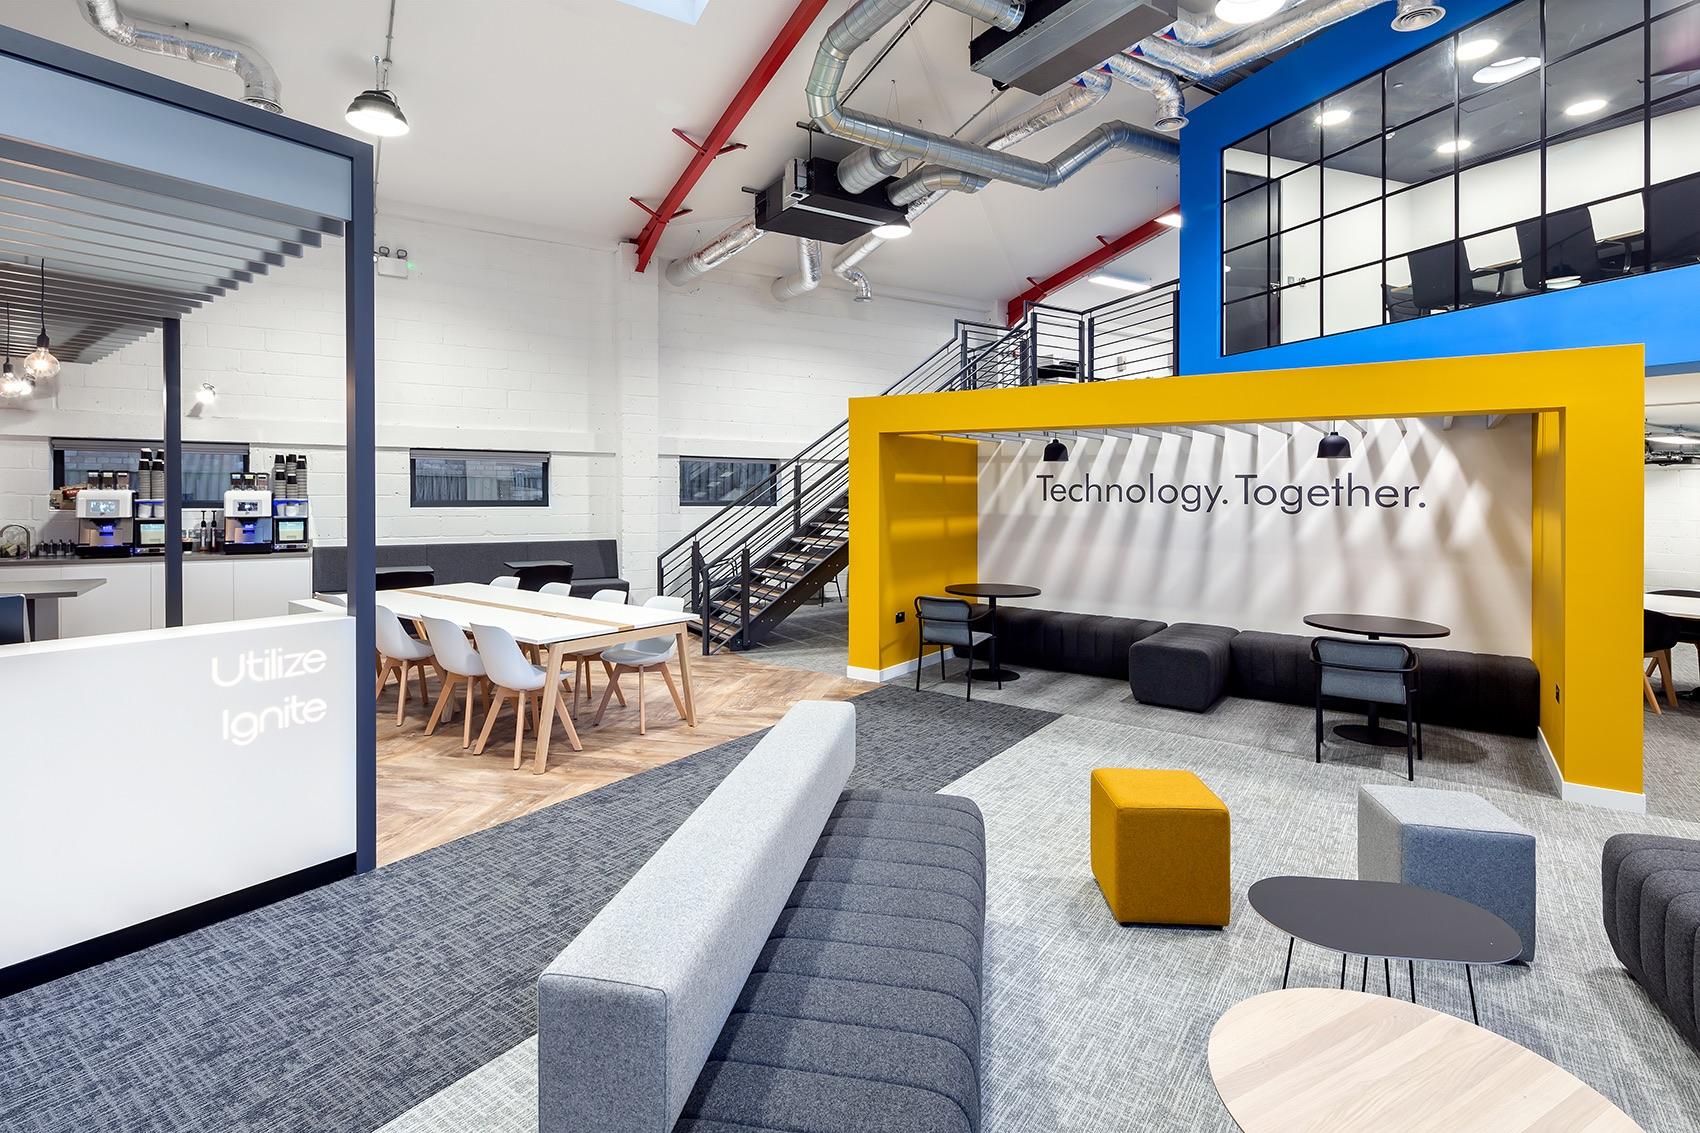 A Tour of Utilize's New Basildon Office